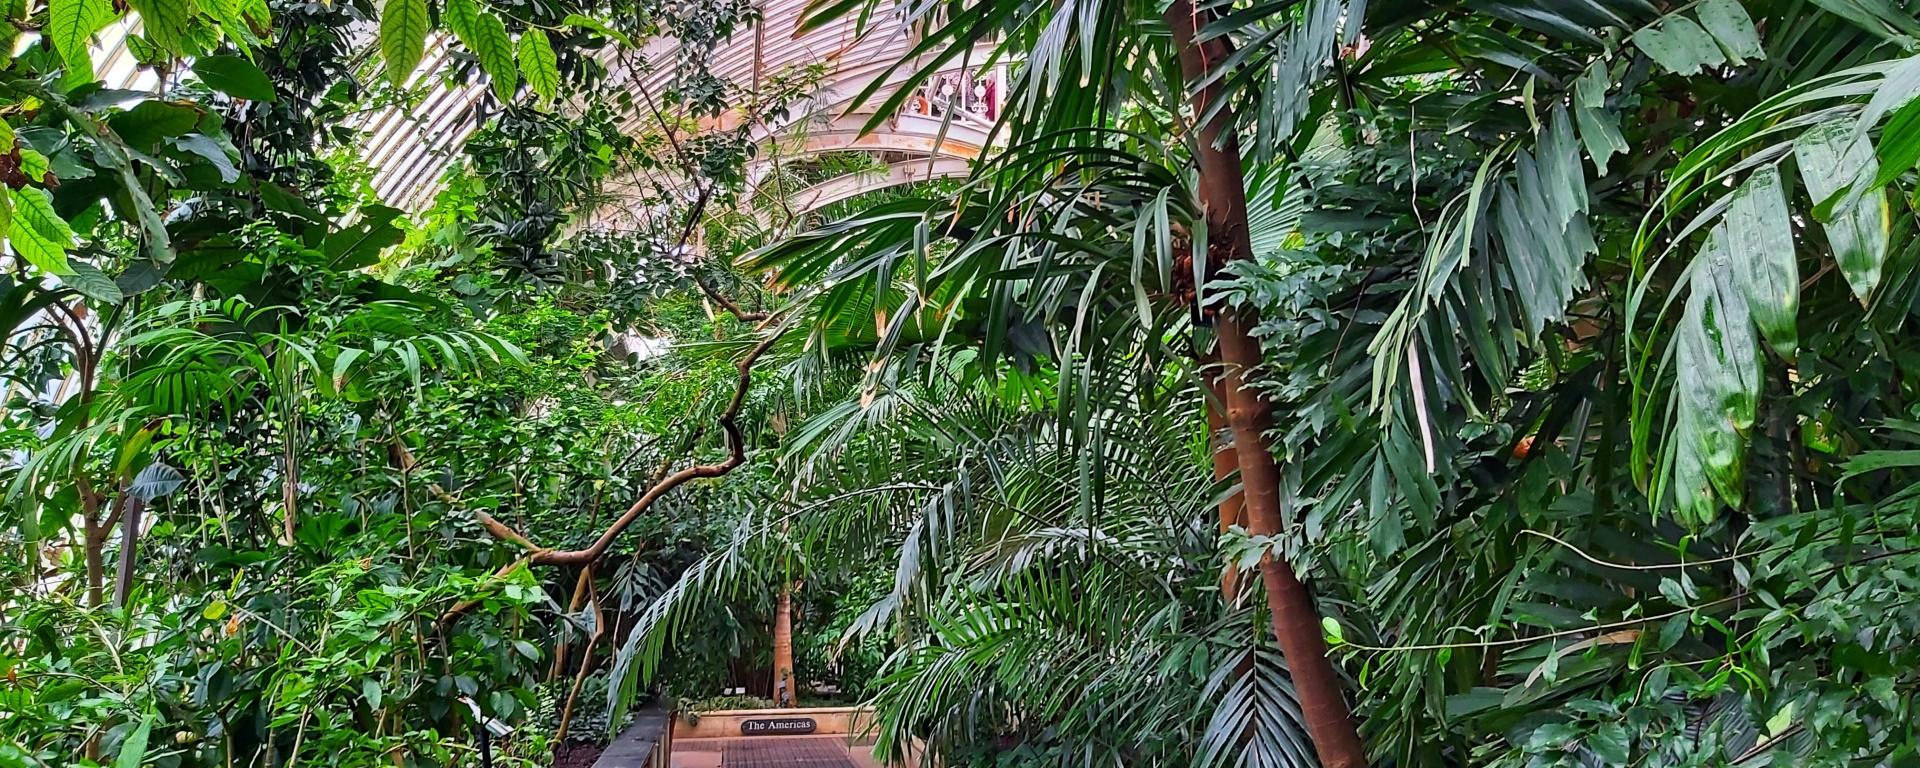 Kew Gardens - tall palm trees